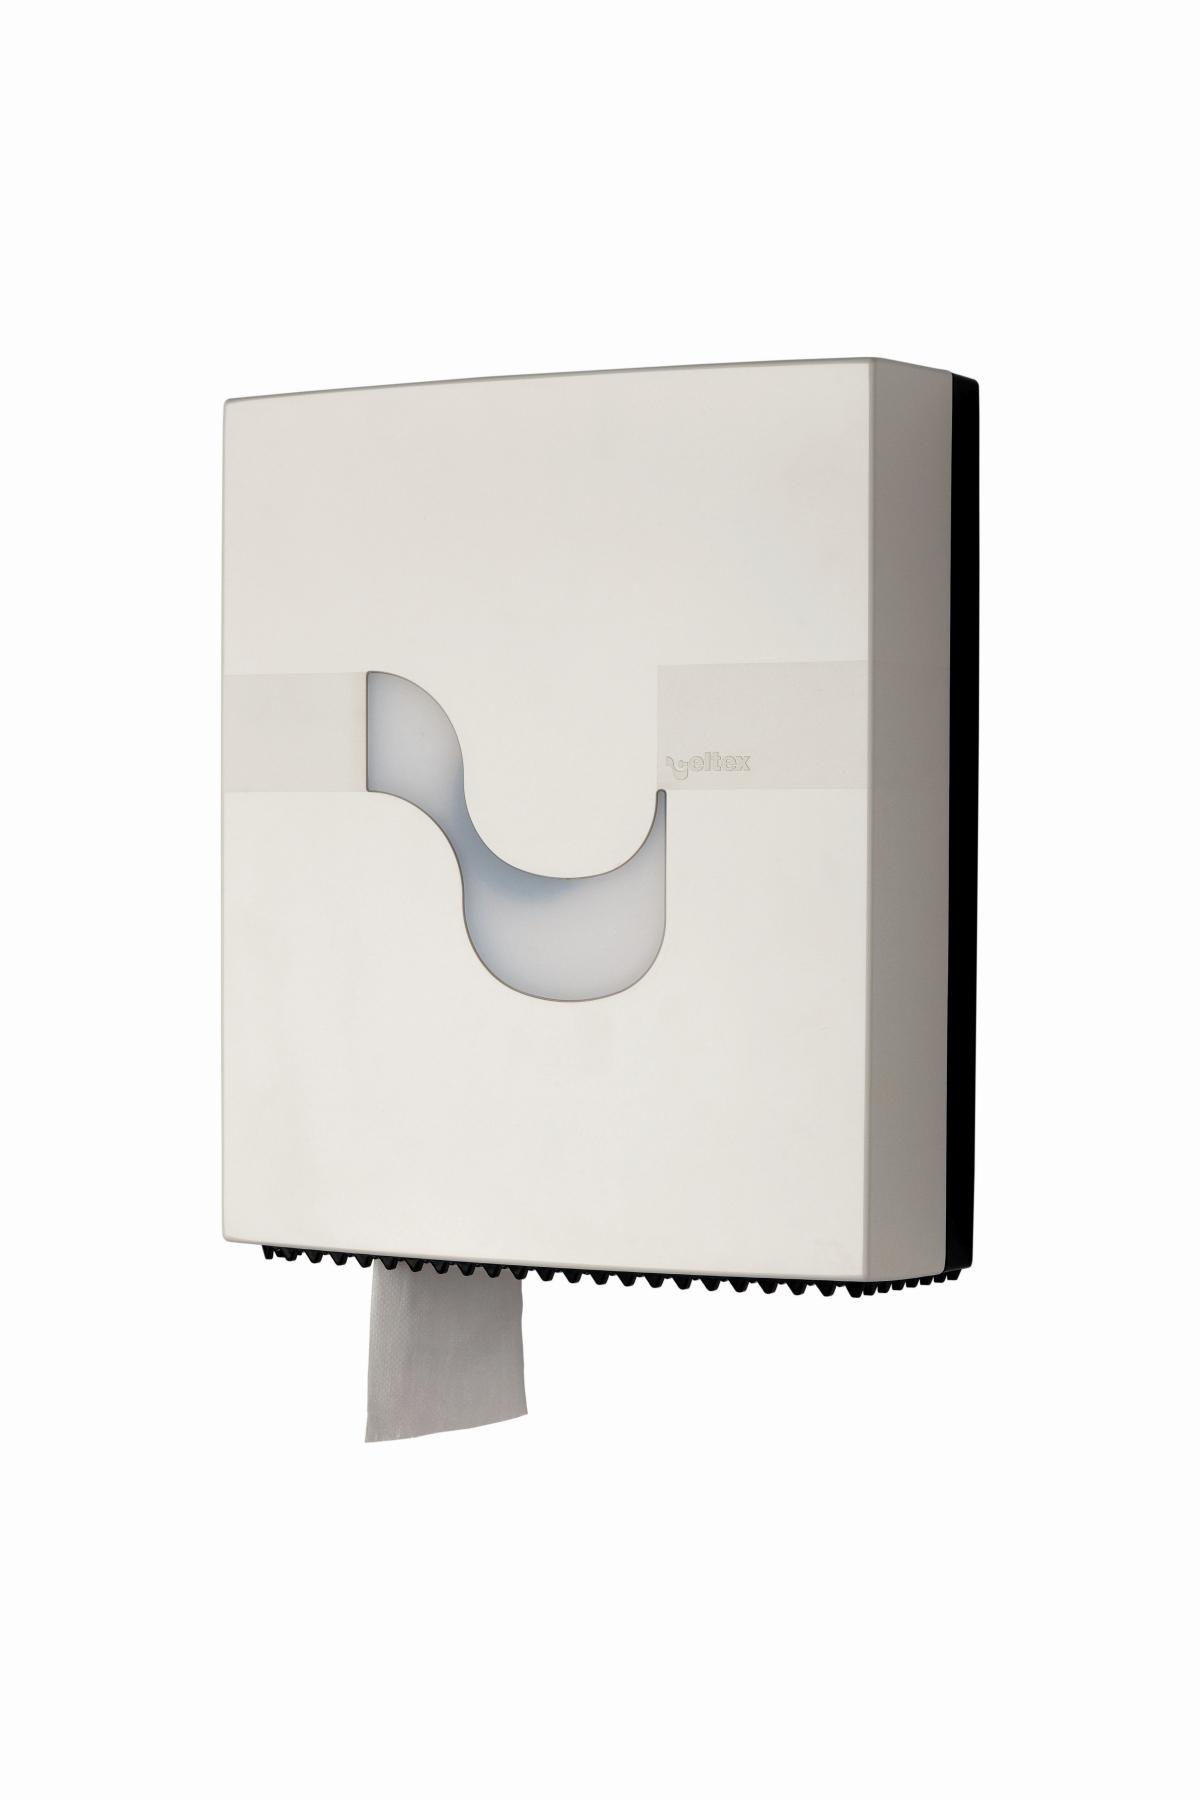 Toilettenpapierspender Jumbo weiß